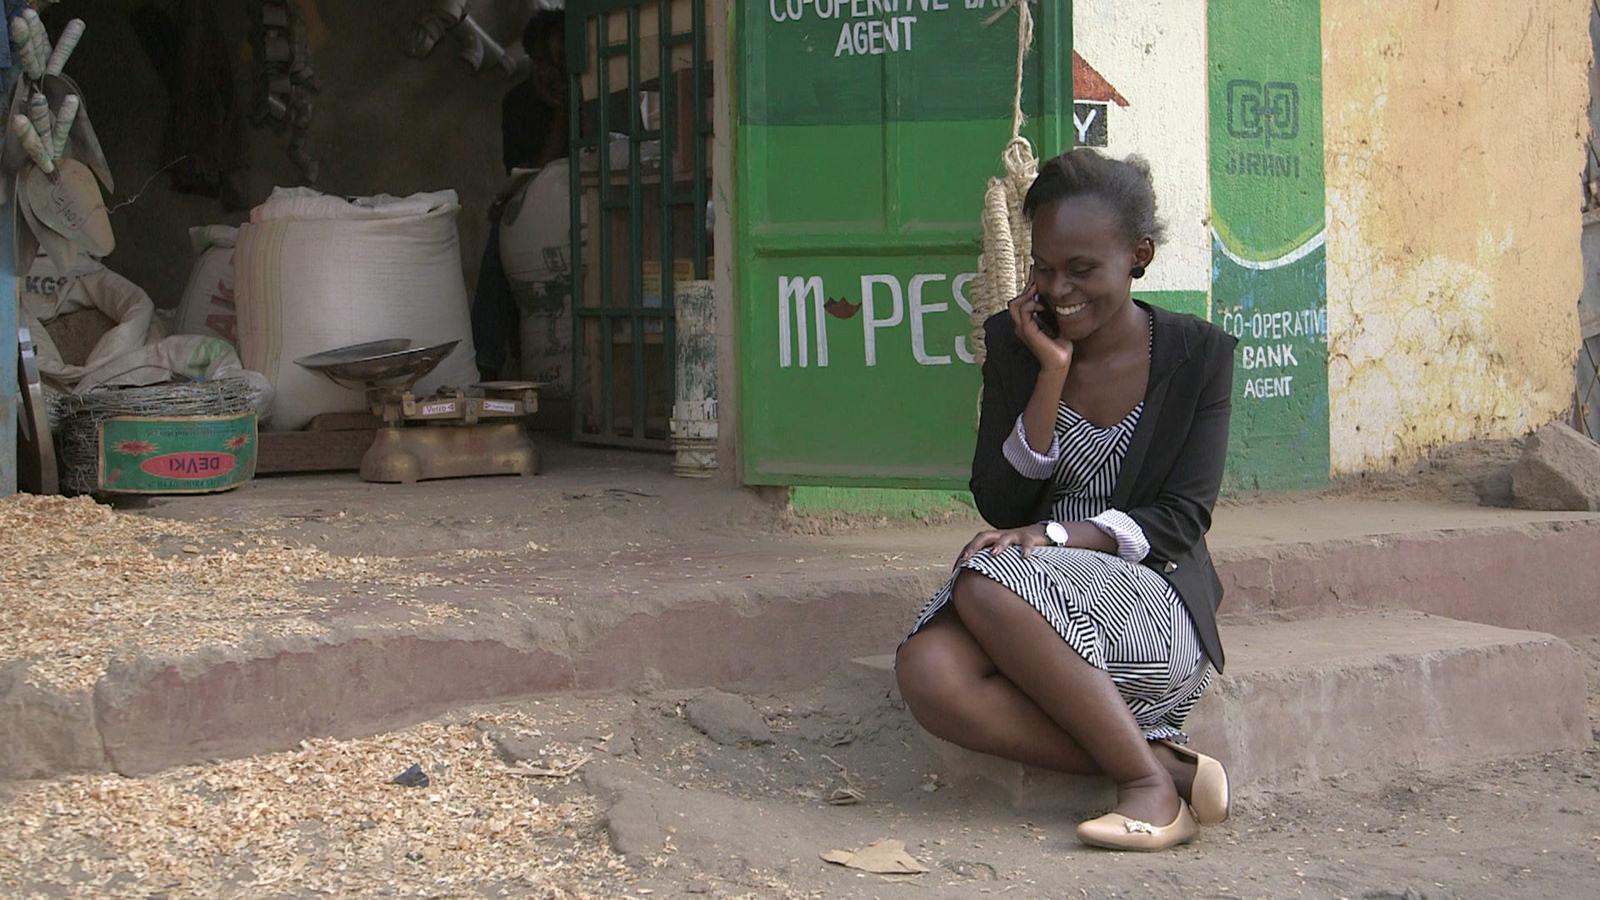 mobile money, Kenya, woman on phone